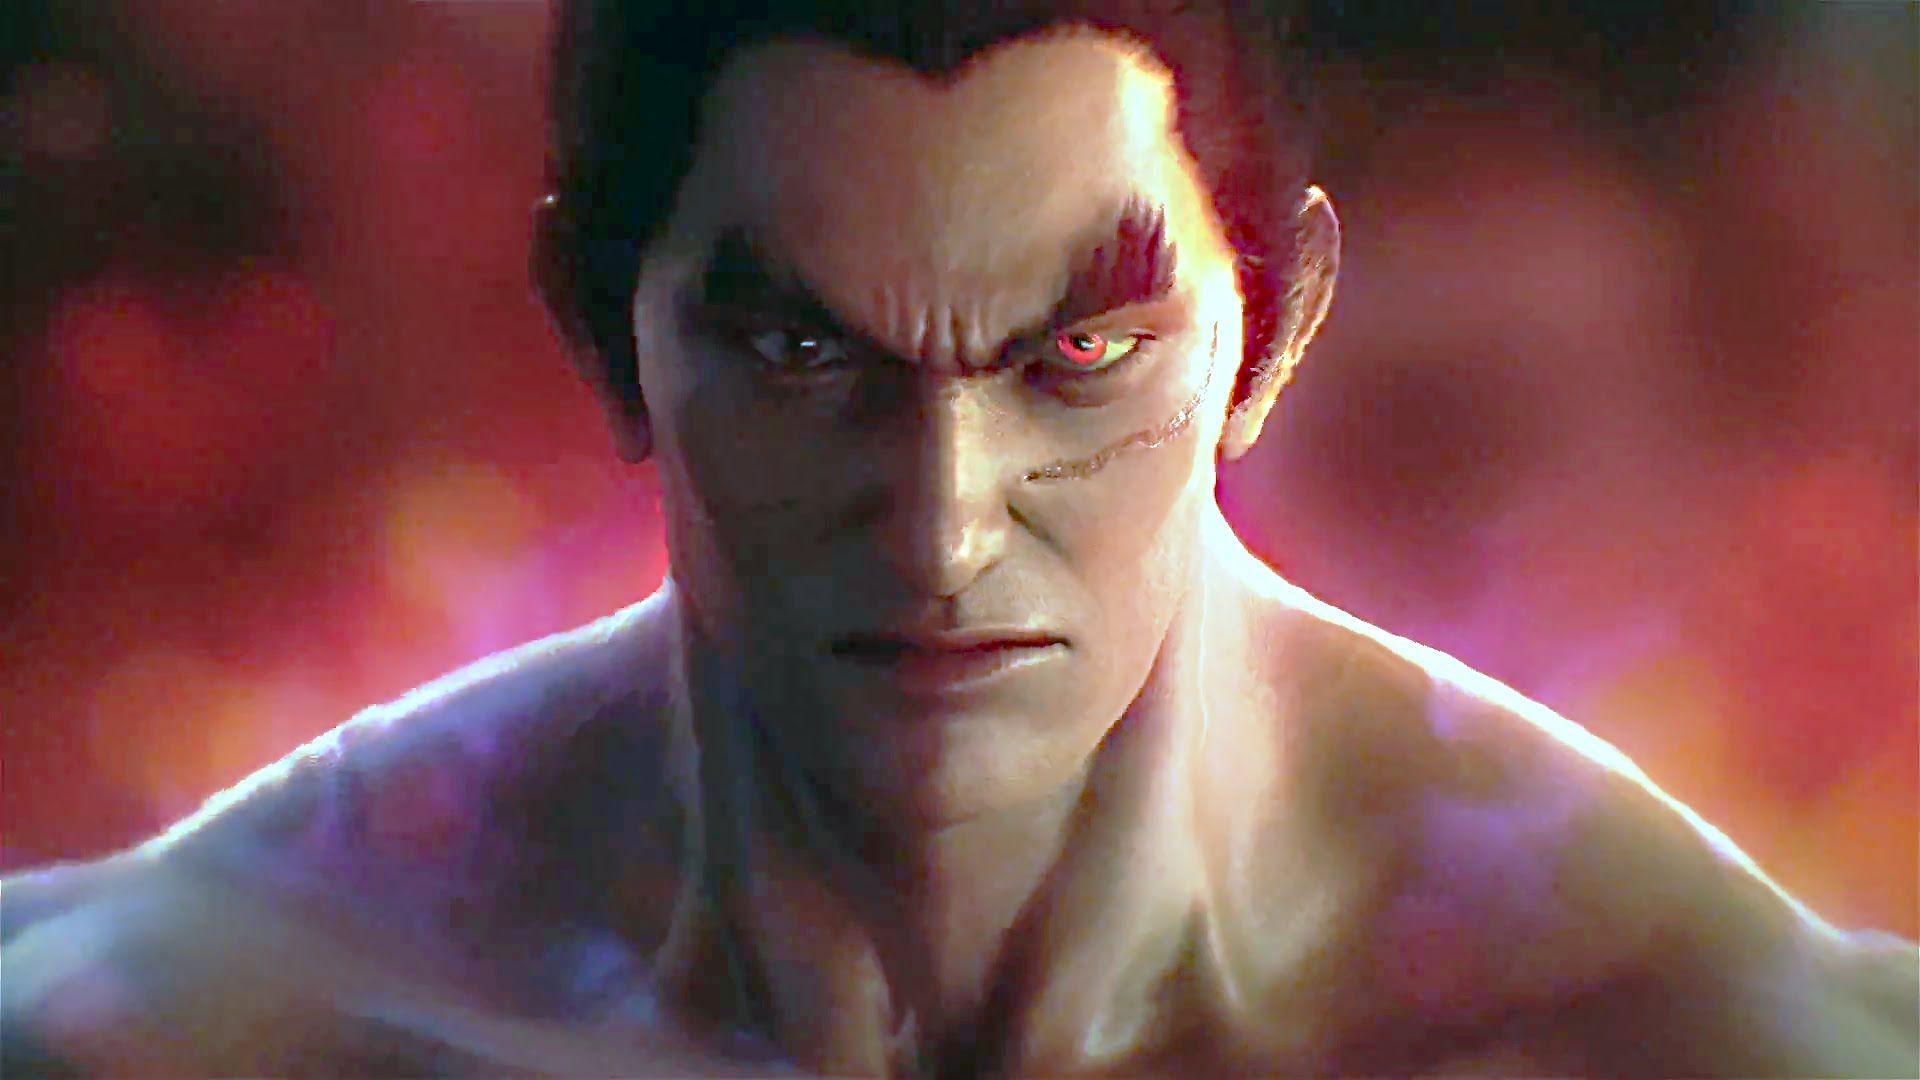 Kazuya From Tekken Revealed As Penultimate Super Smash Bros. Ultimate DLC Character